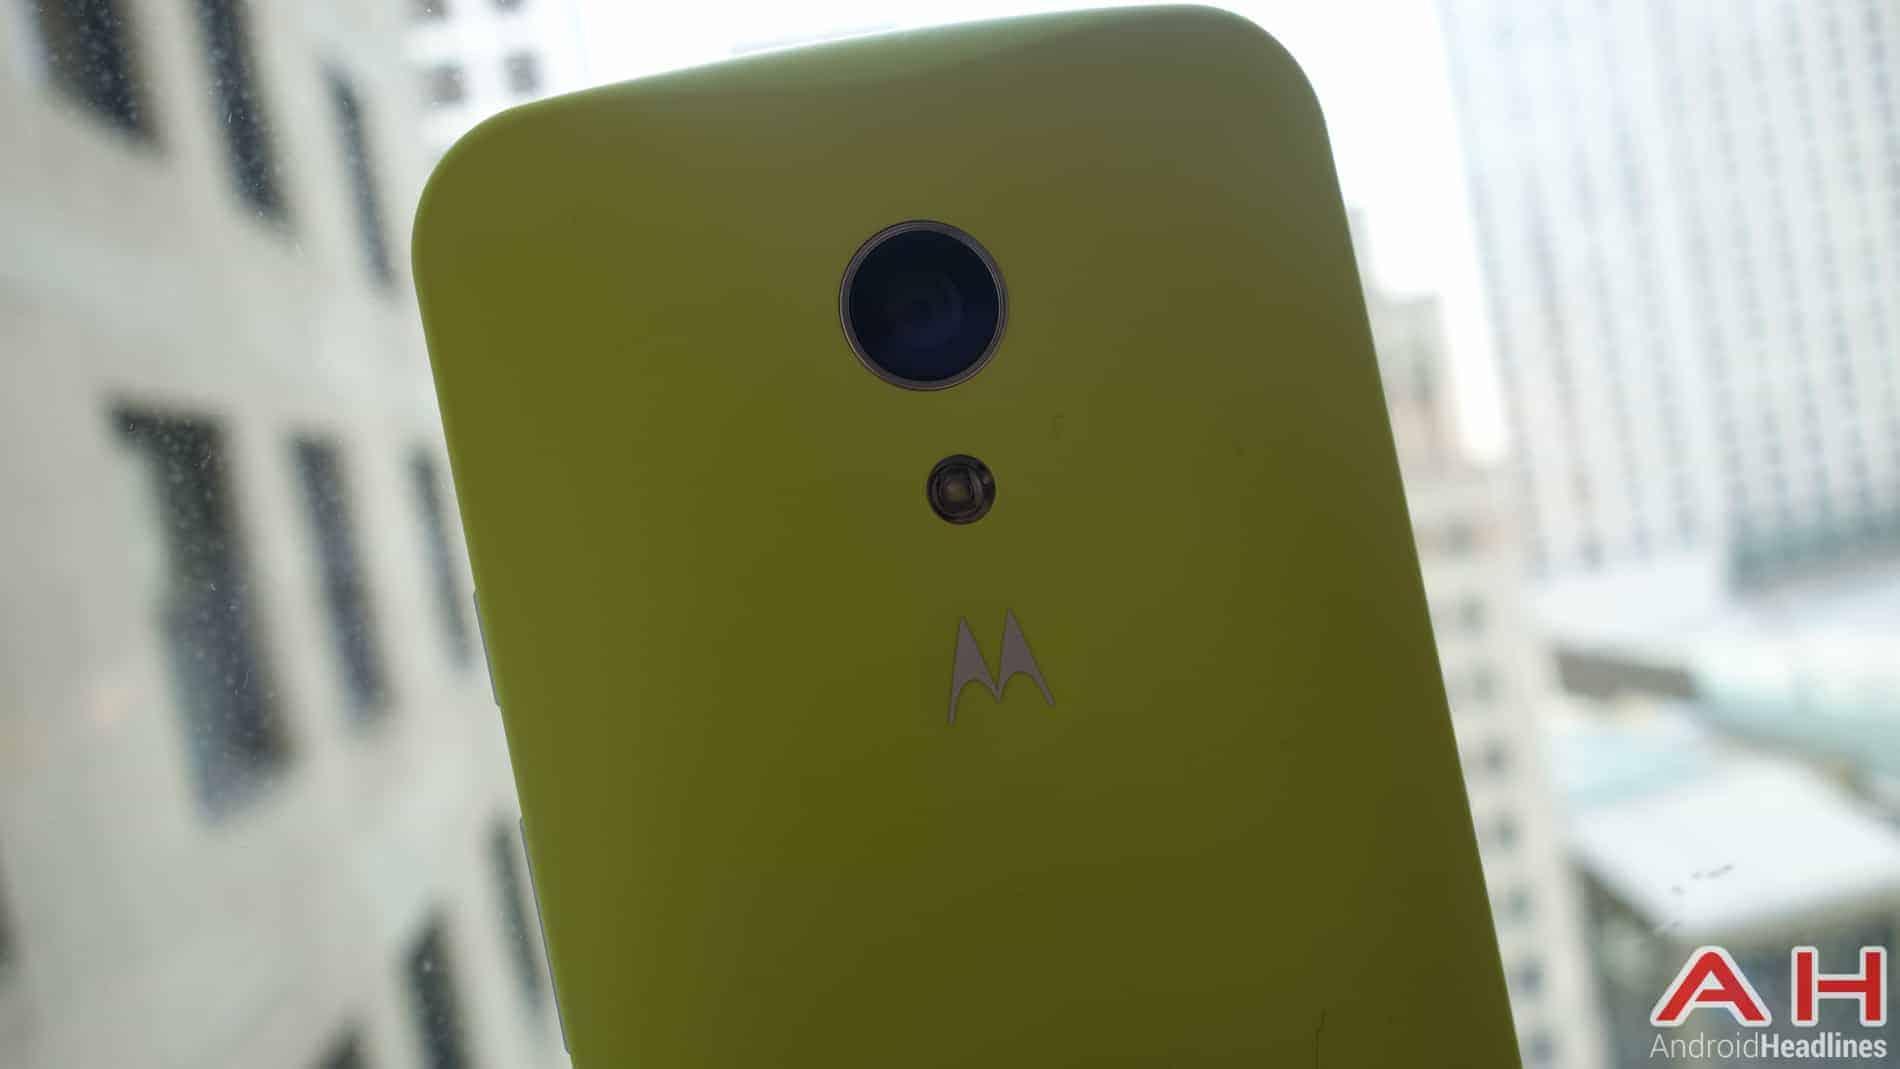 Motorola AH 283